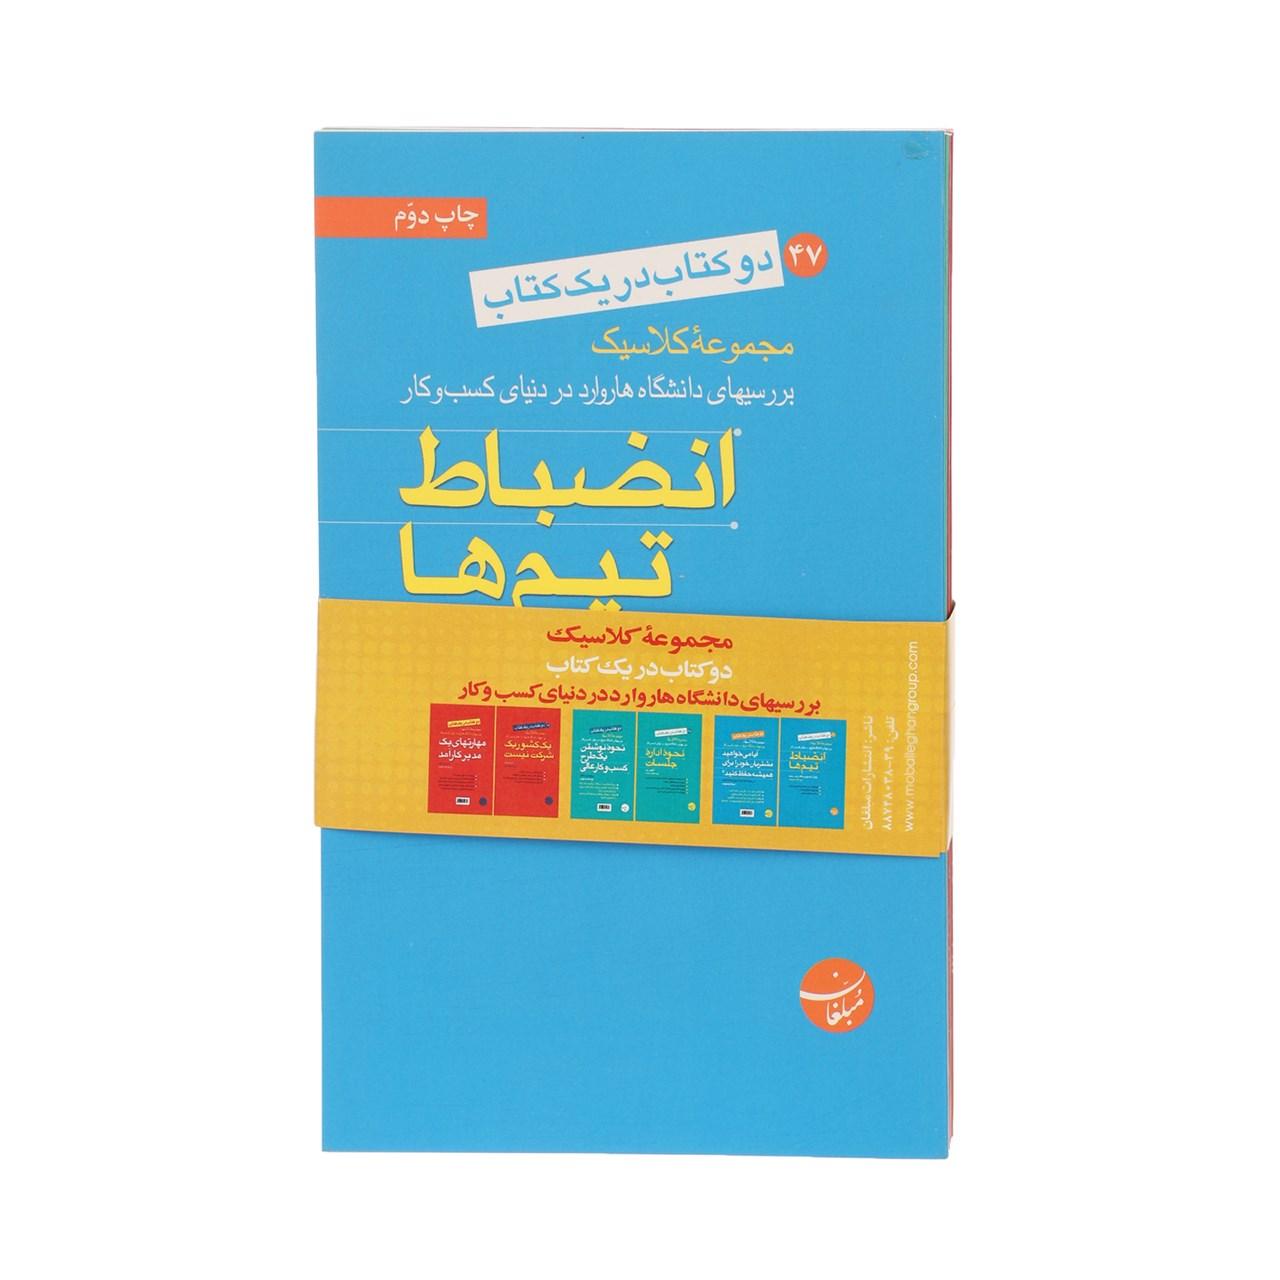 کتاب مجموعه کلاسیک اثر  جان آر. کتسنبک - شش جلدی